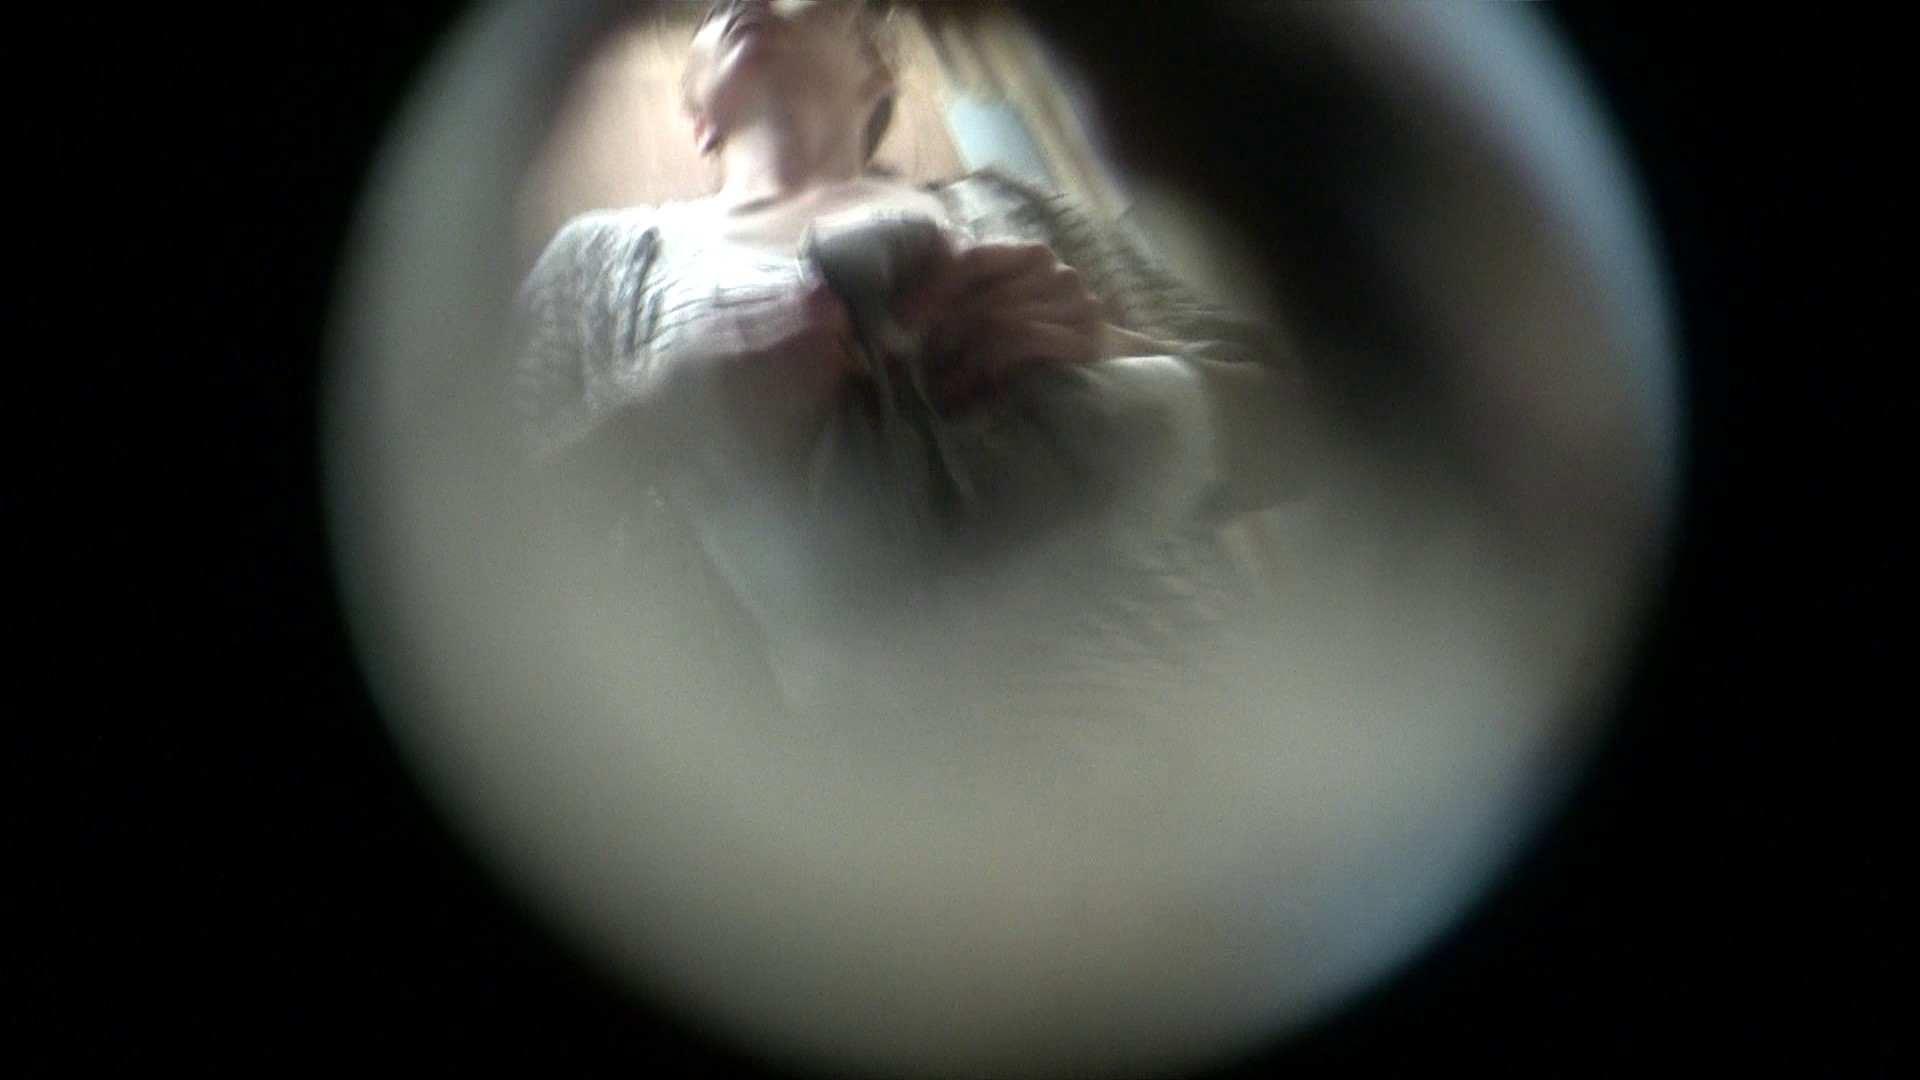 NO.01 胃下垂気味のへそピアスギャル 覗きもの AV無料 78枚 11